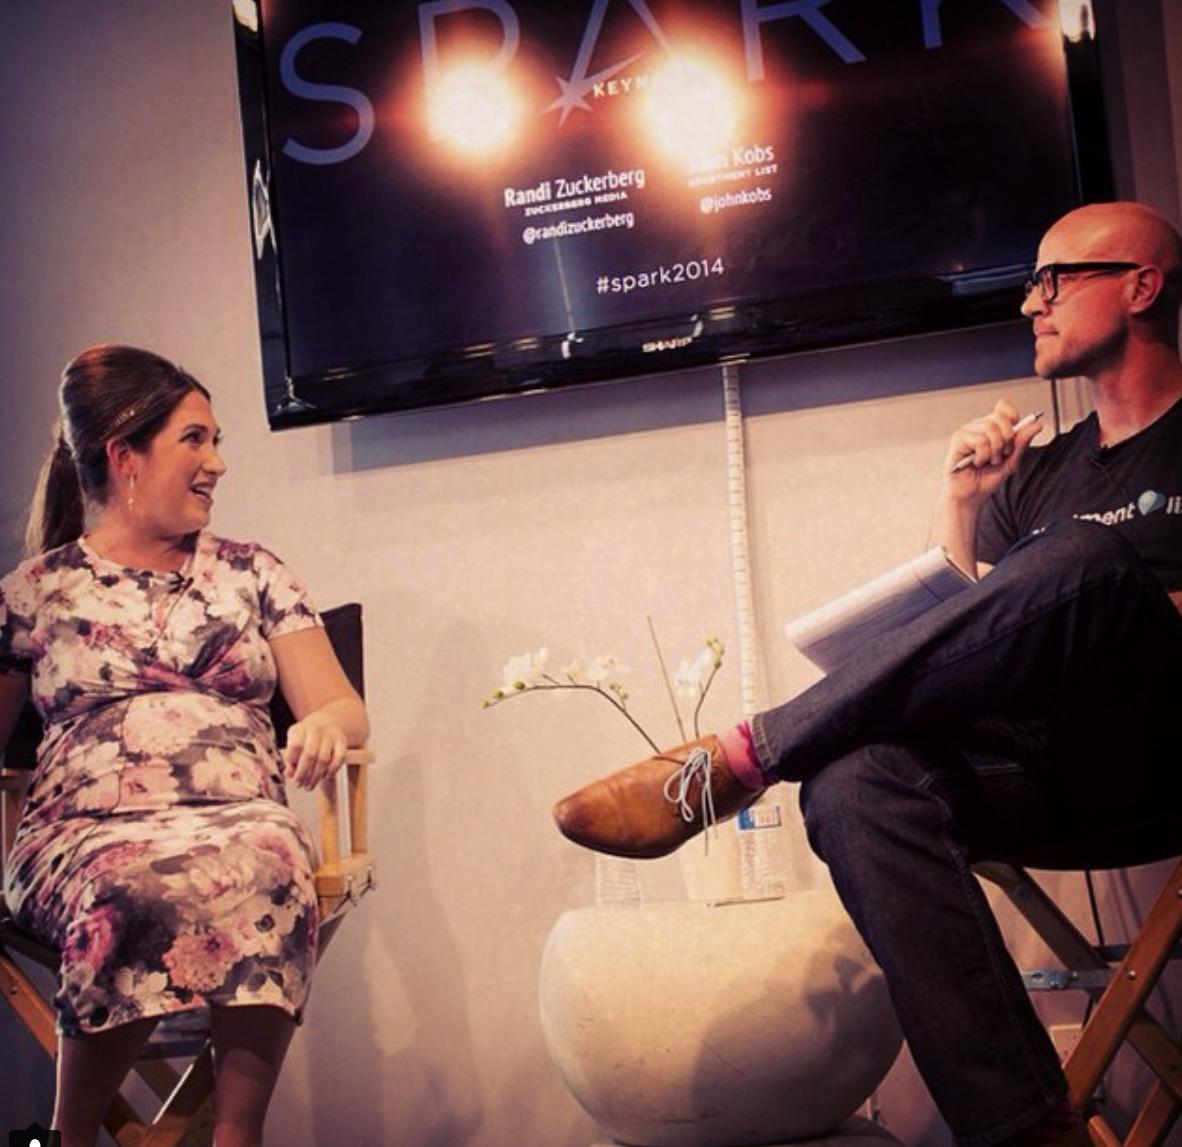 John interviews Randi Zuckerberg - September 2014   John sits down with Randi Zuckerberg to discuss her new media ventureLINK